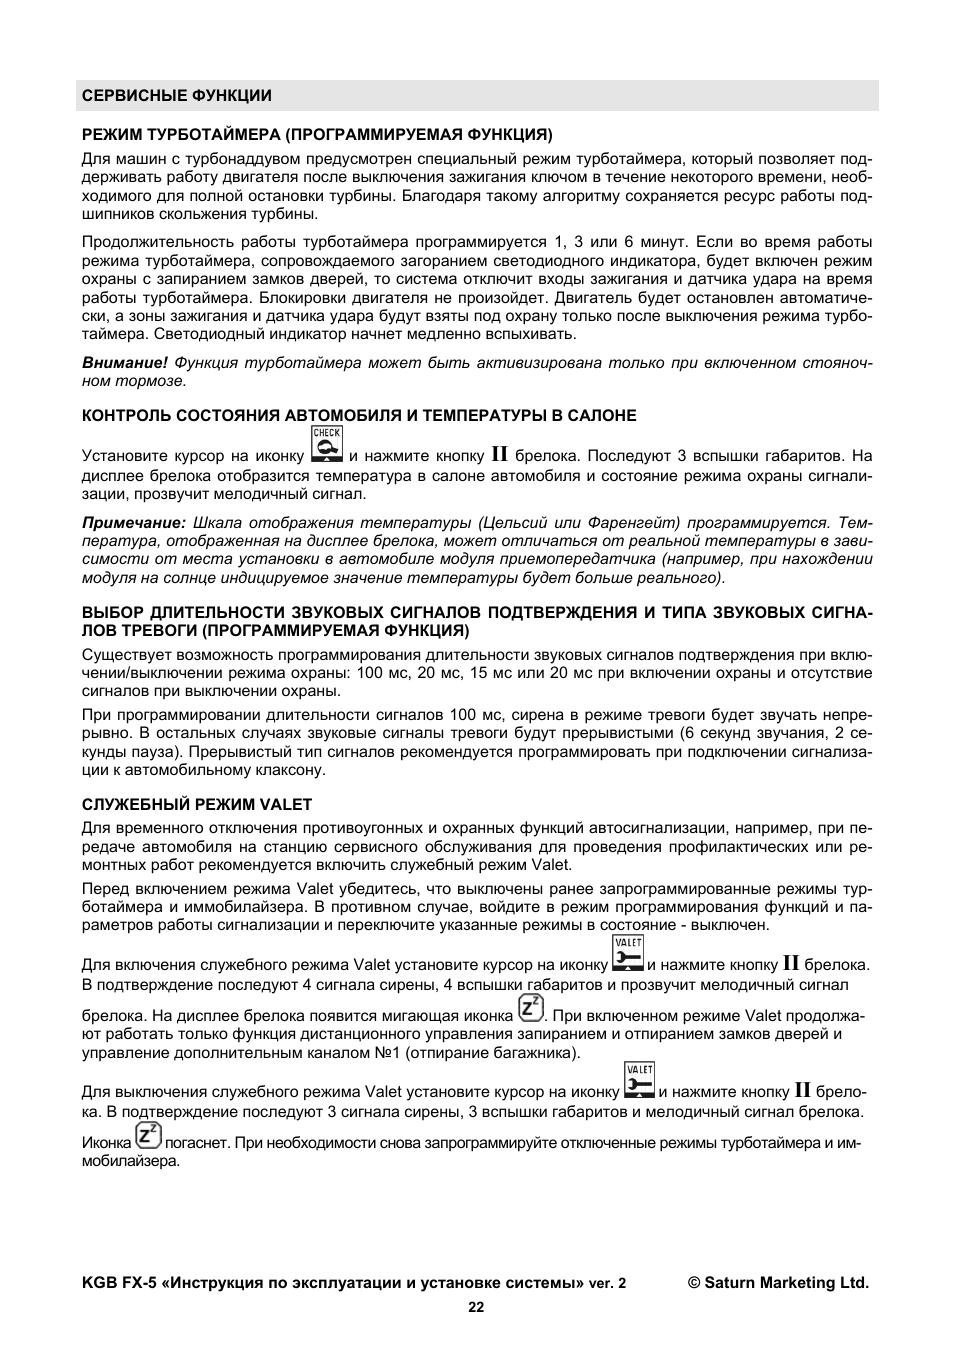 Автосигнализация kgb инструкция tfx 5